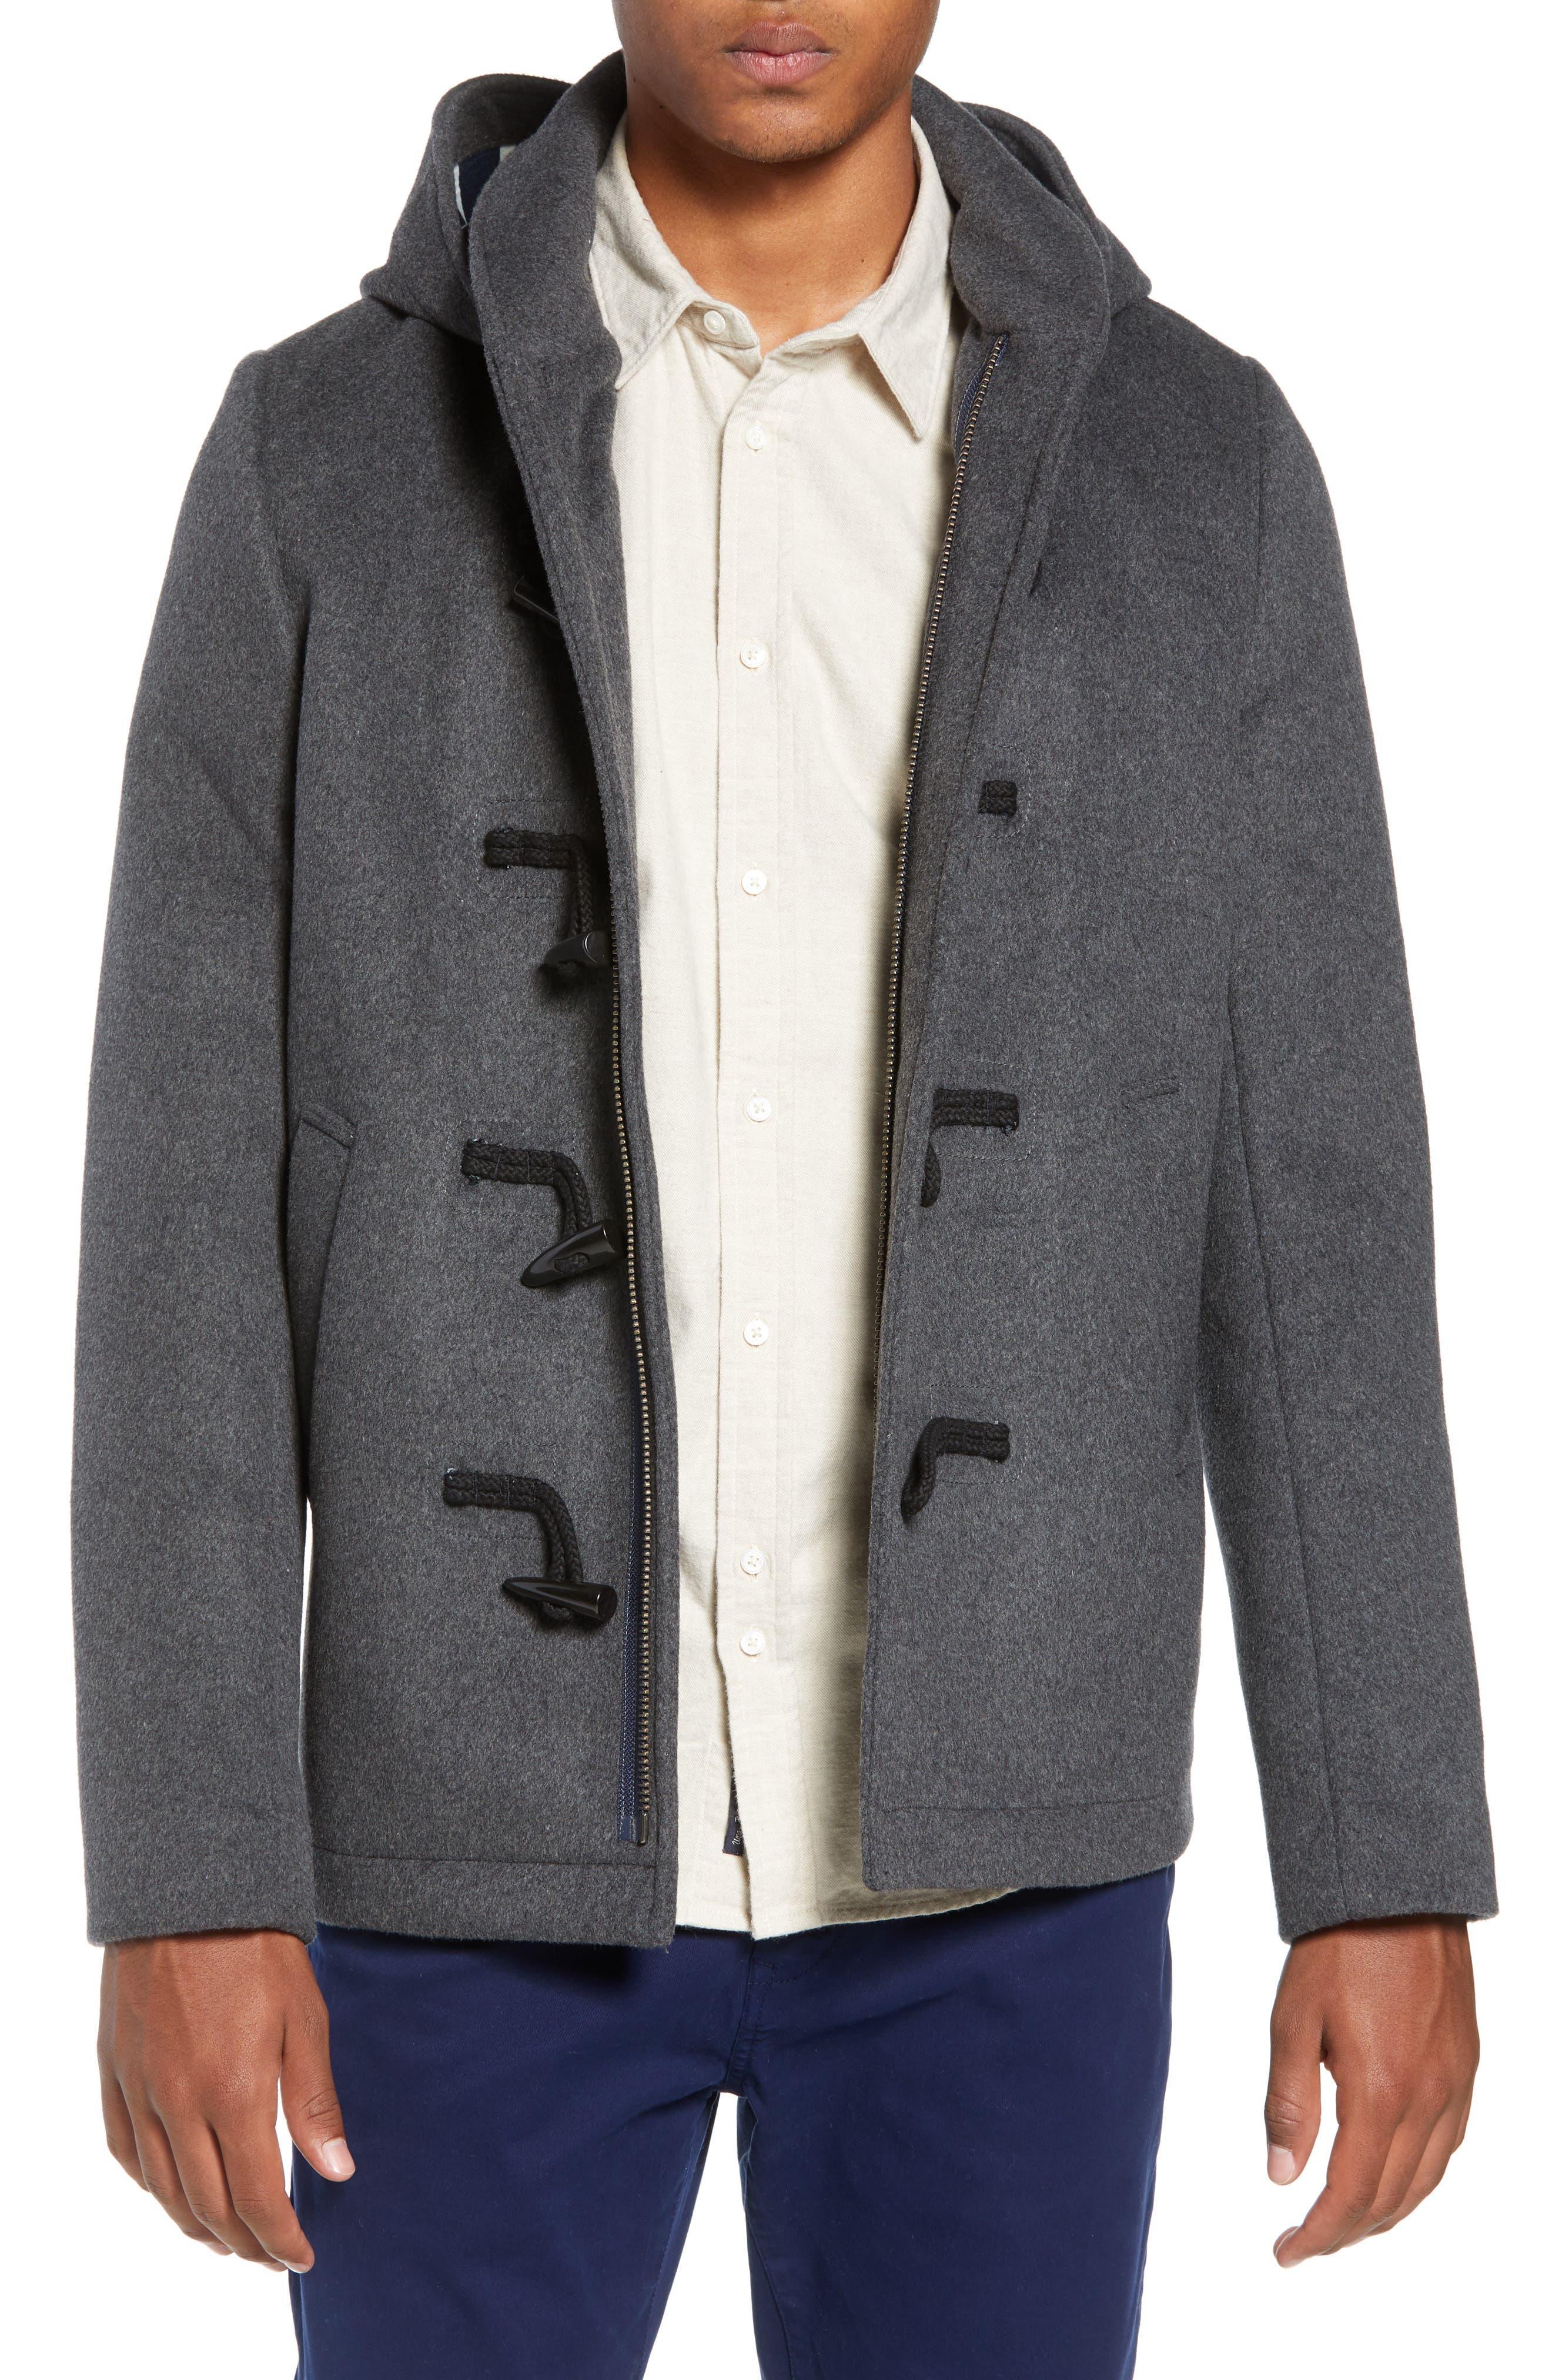 SCOTCH & SODA,                             Wool Blend Duffel Coat,                             Main thumbnail 1, color,                             030